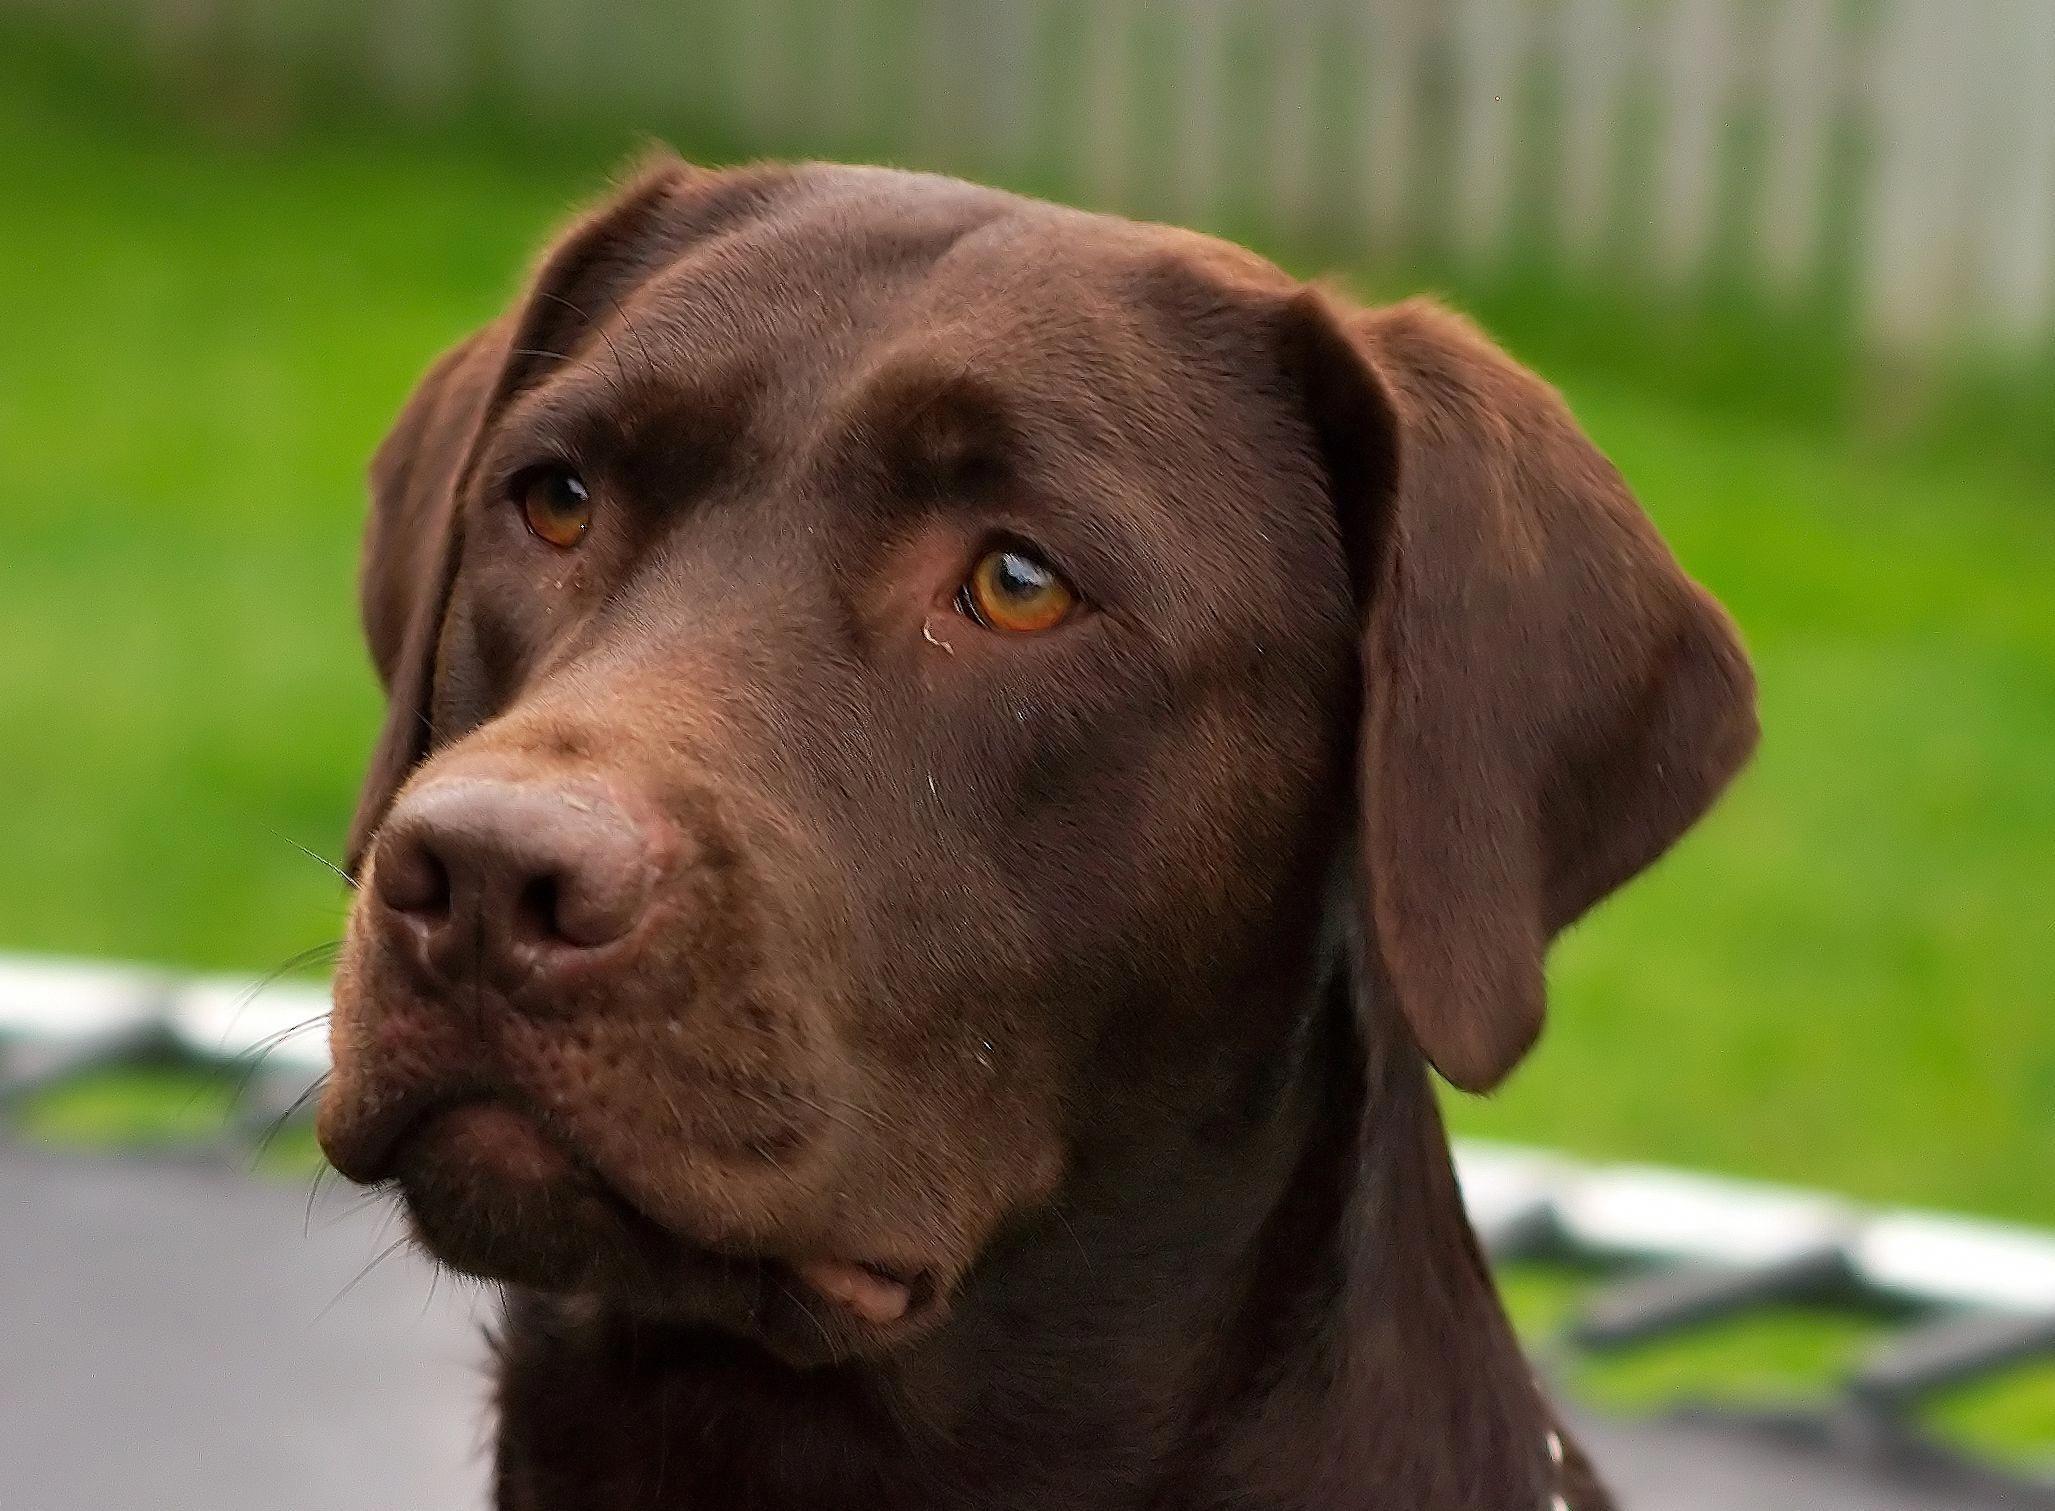 Labrador Retriever Wikipedia The Free Encyclopedia Land Of